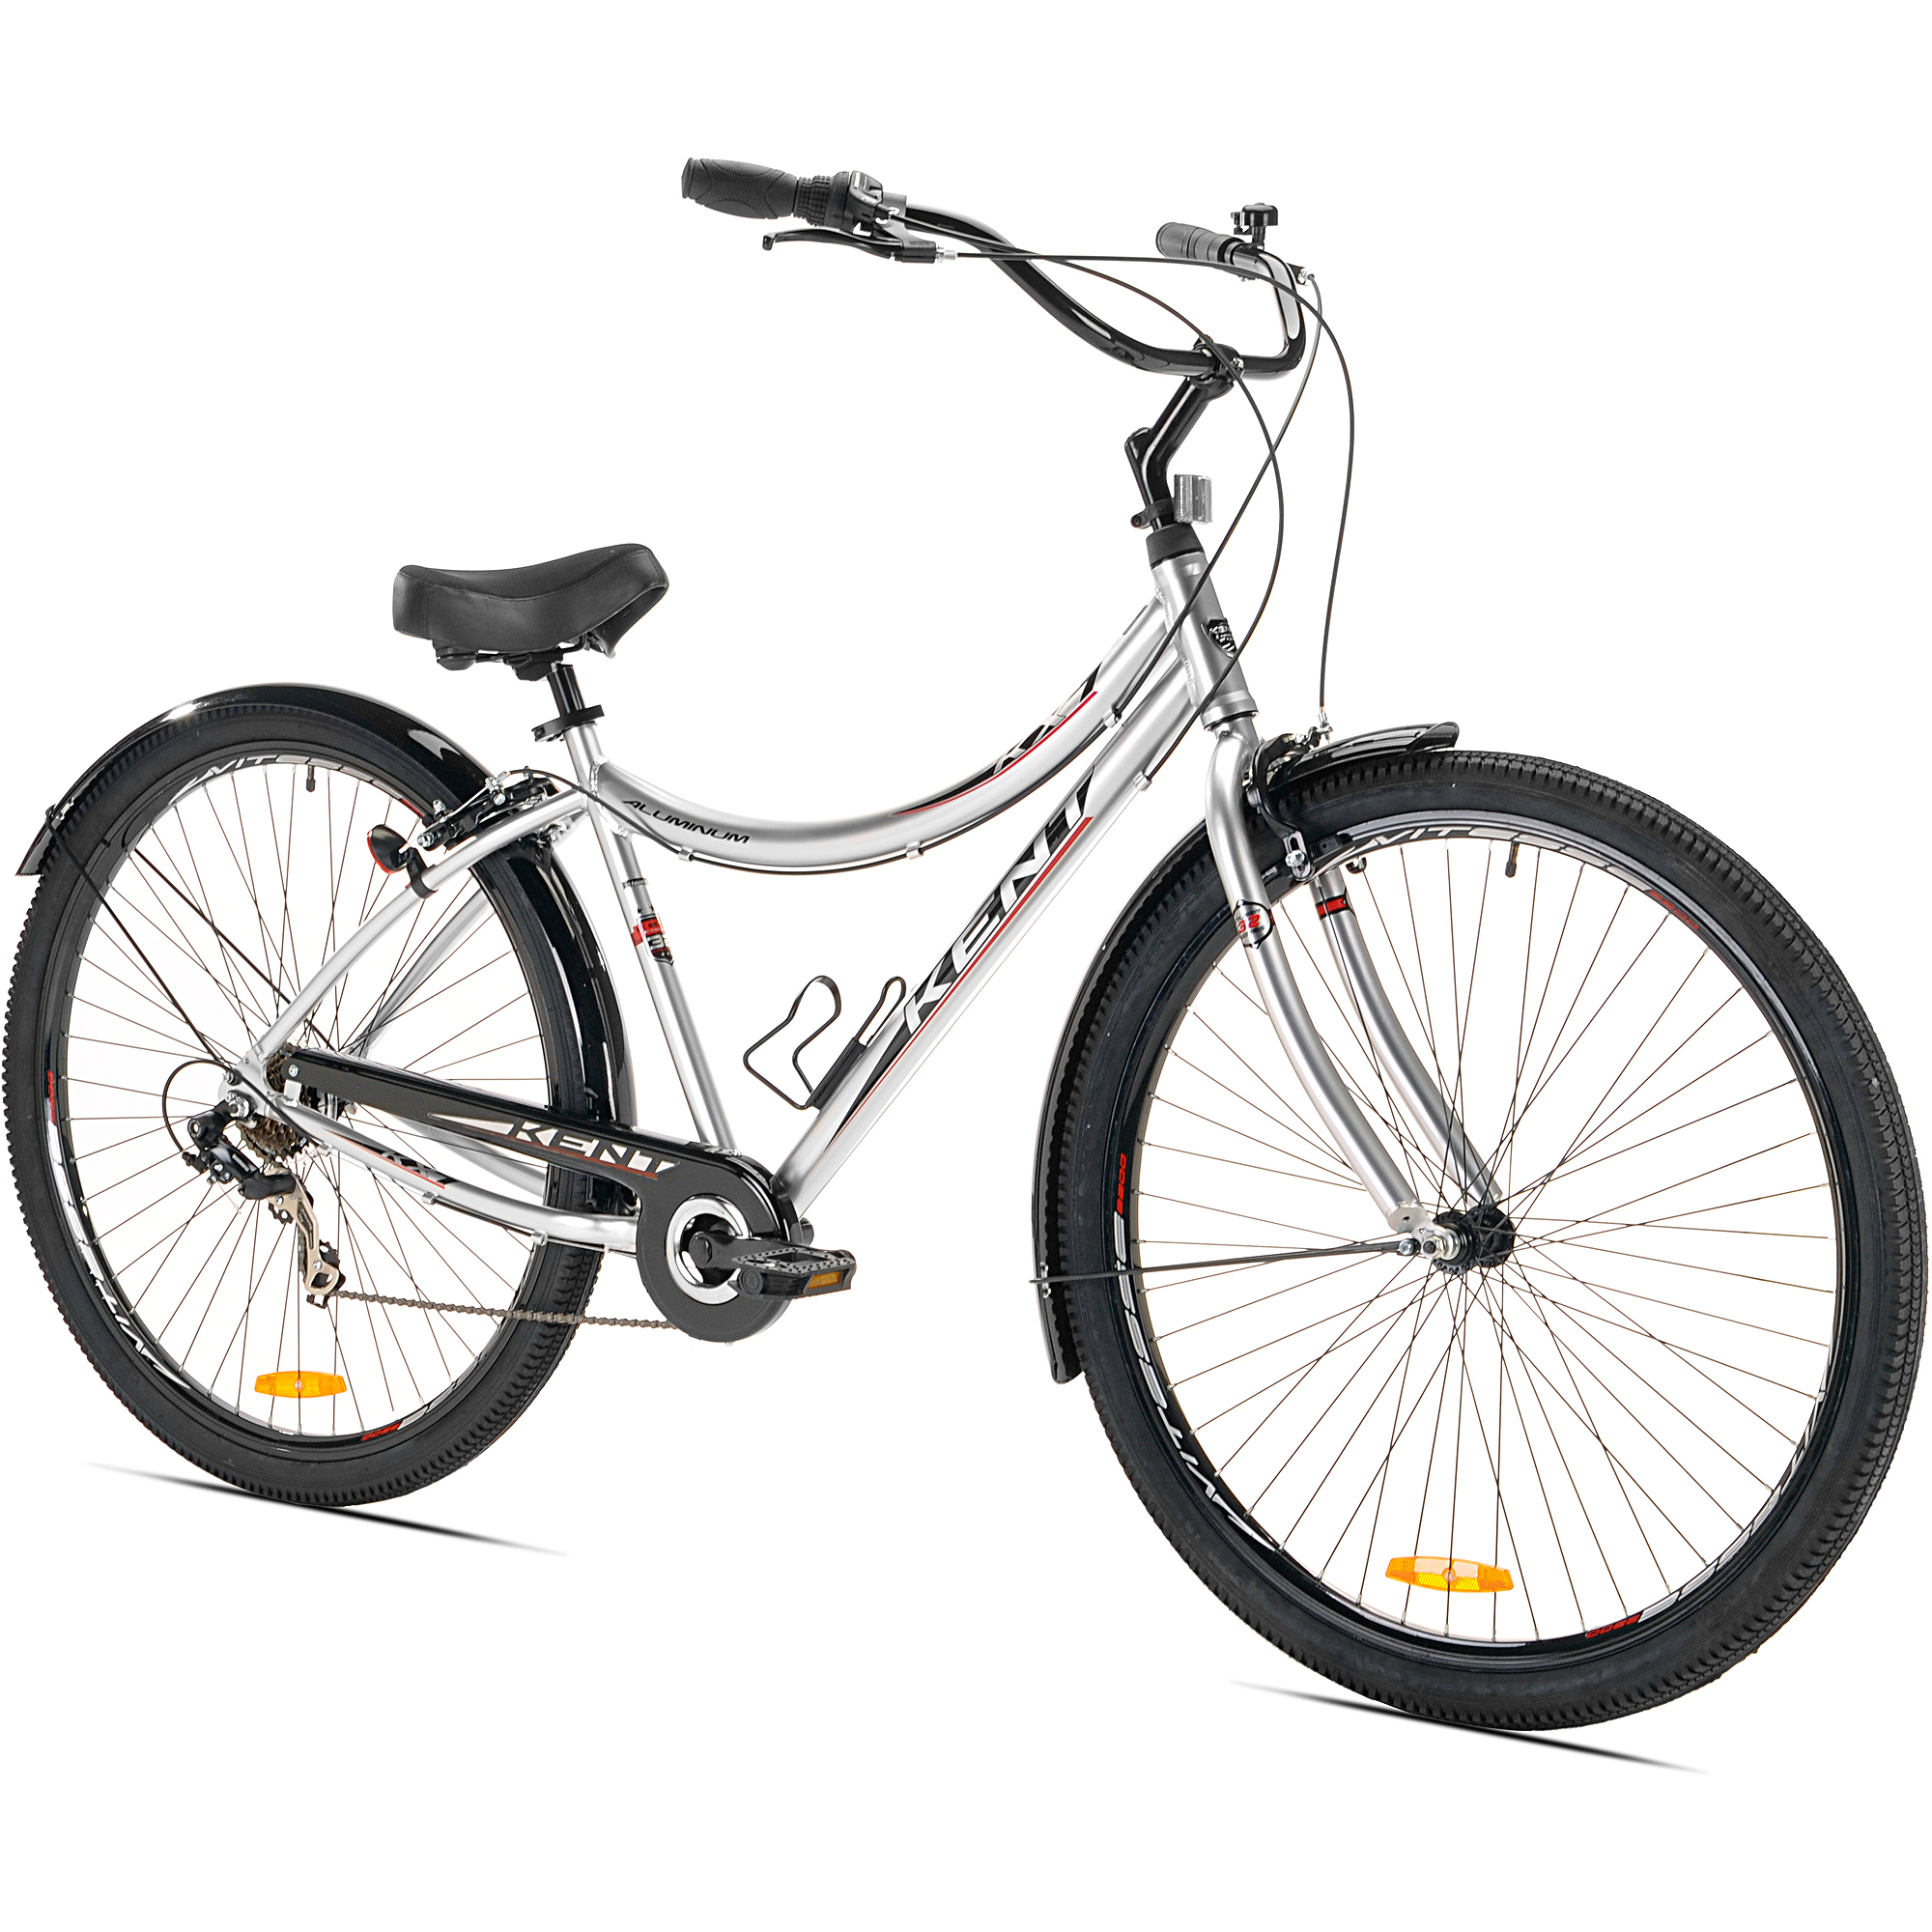 "32"" Kent KX-7 Men's Cruiser Bike, Silver"